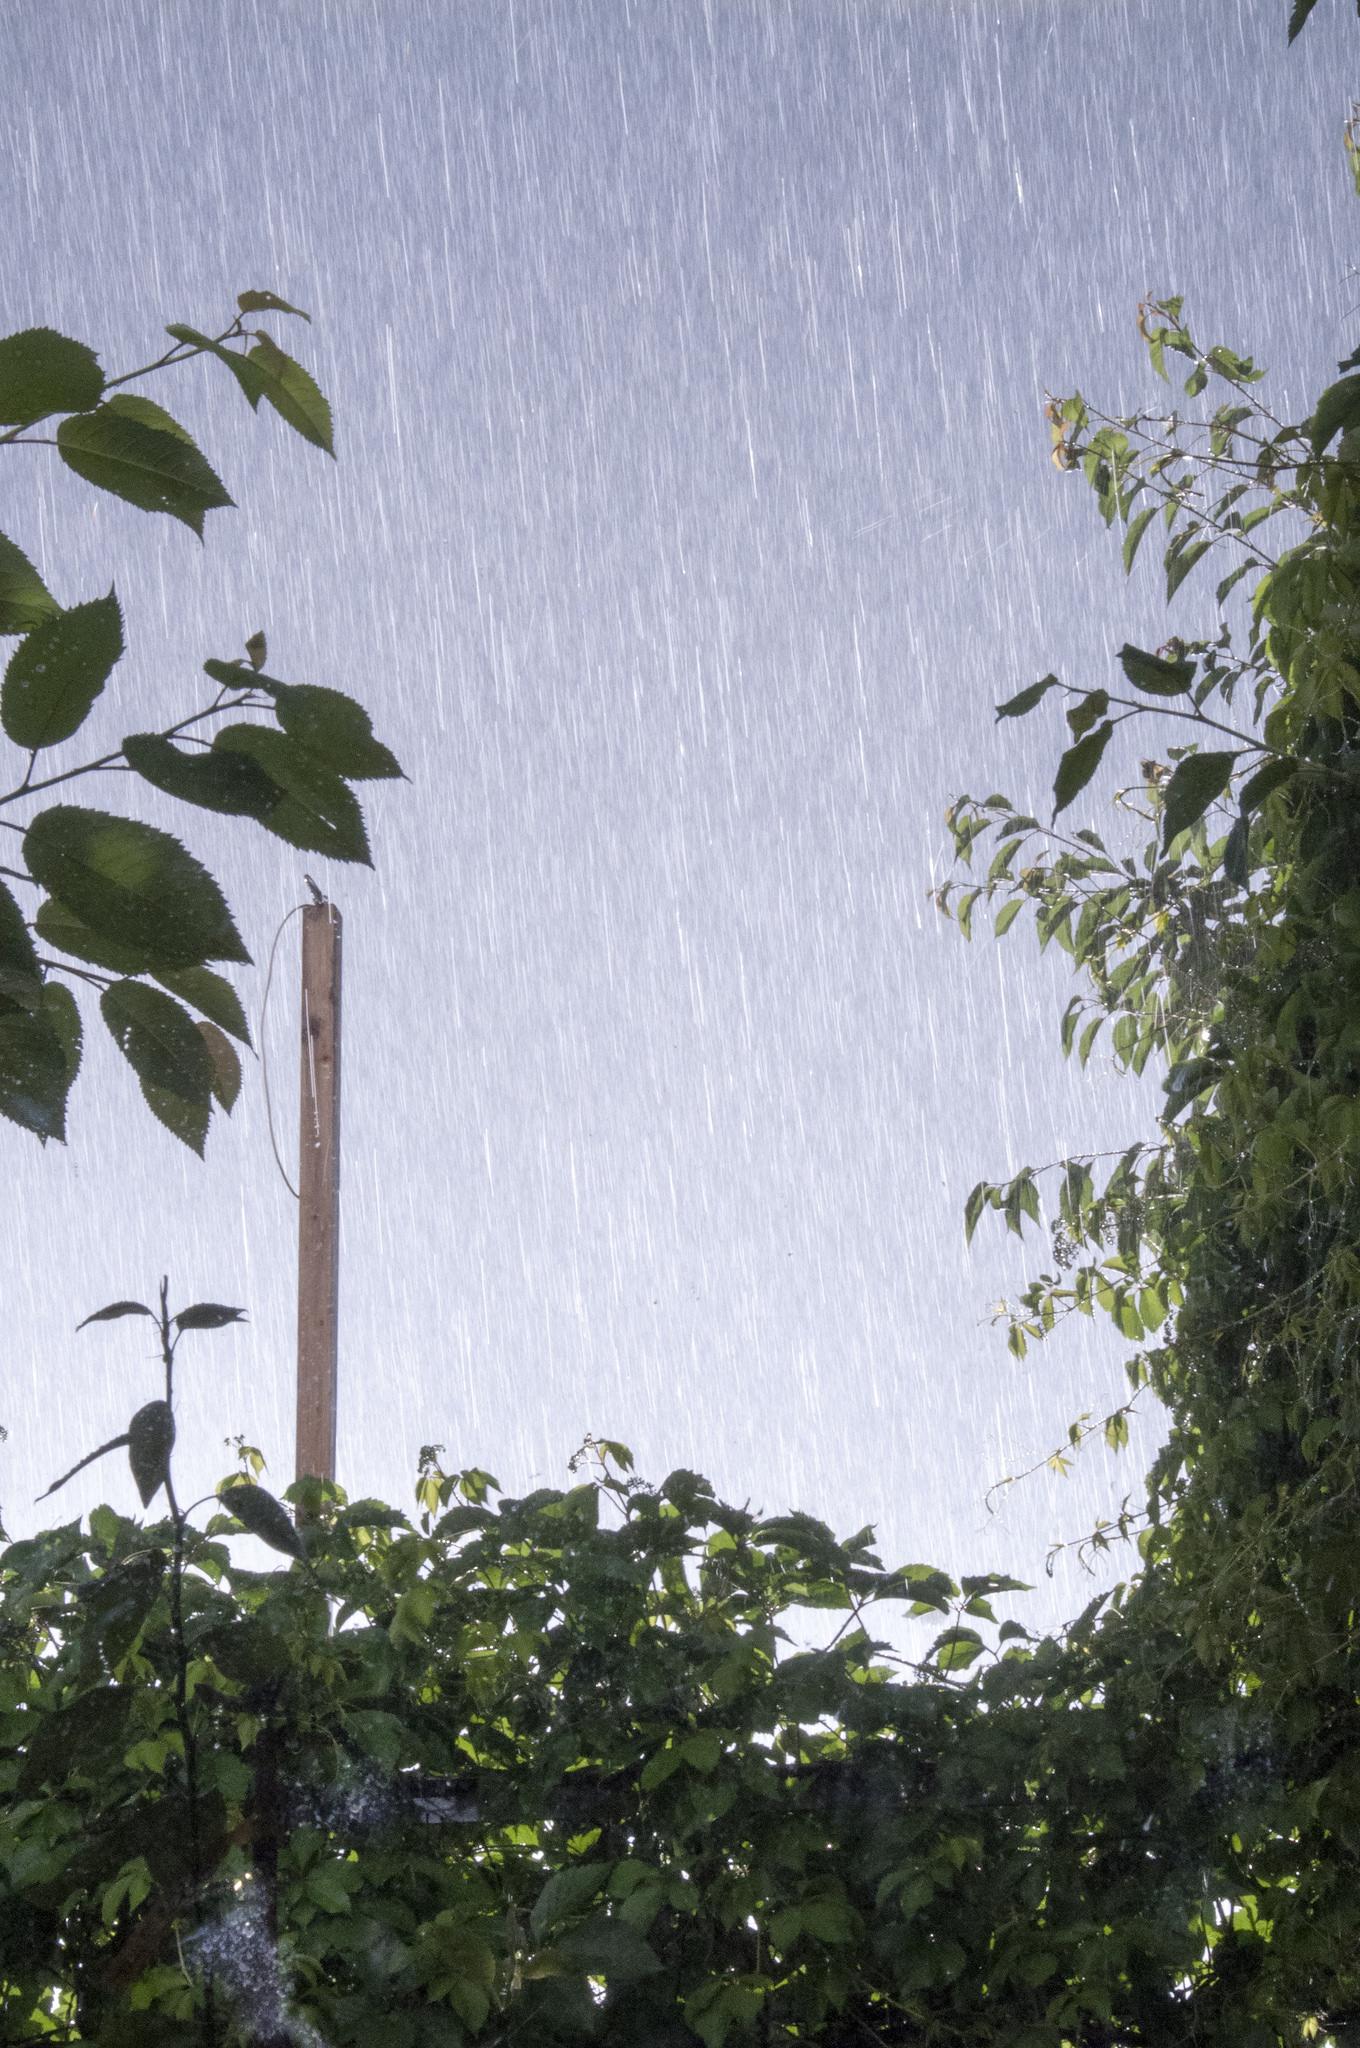 Heavy Rain by Sunshine